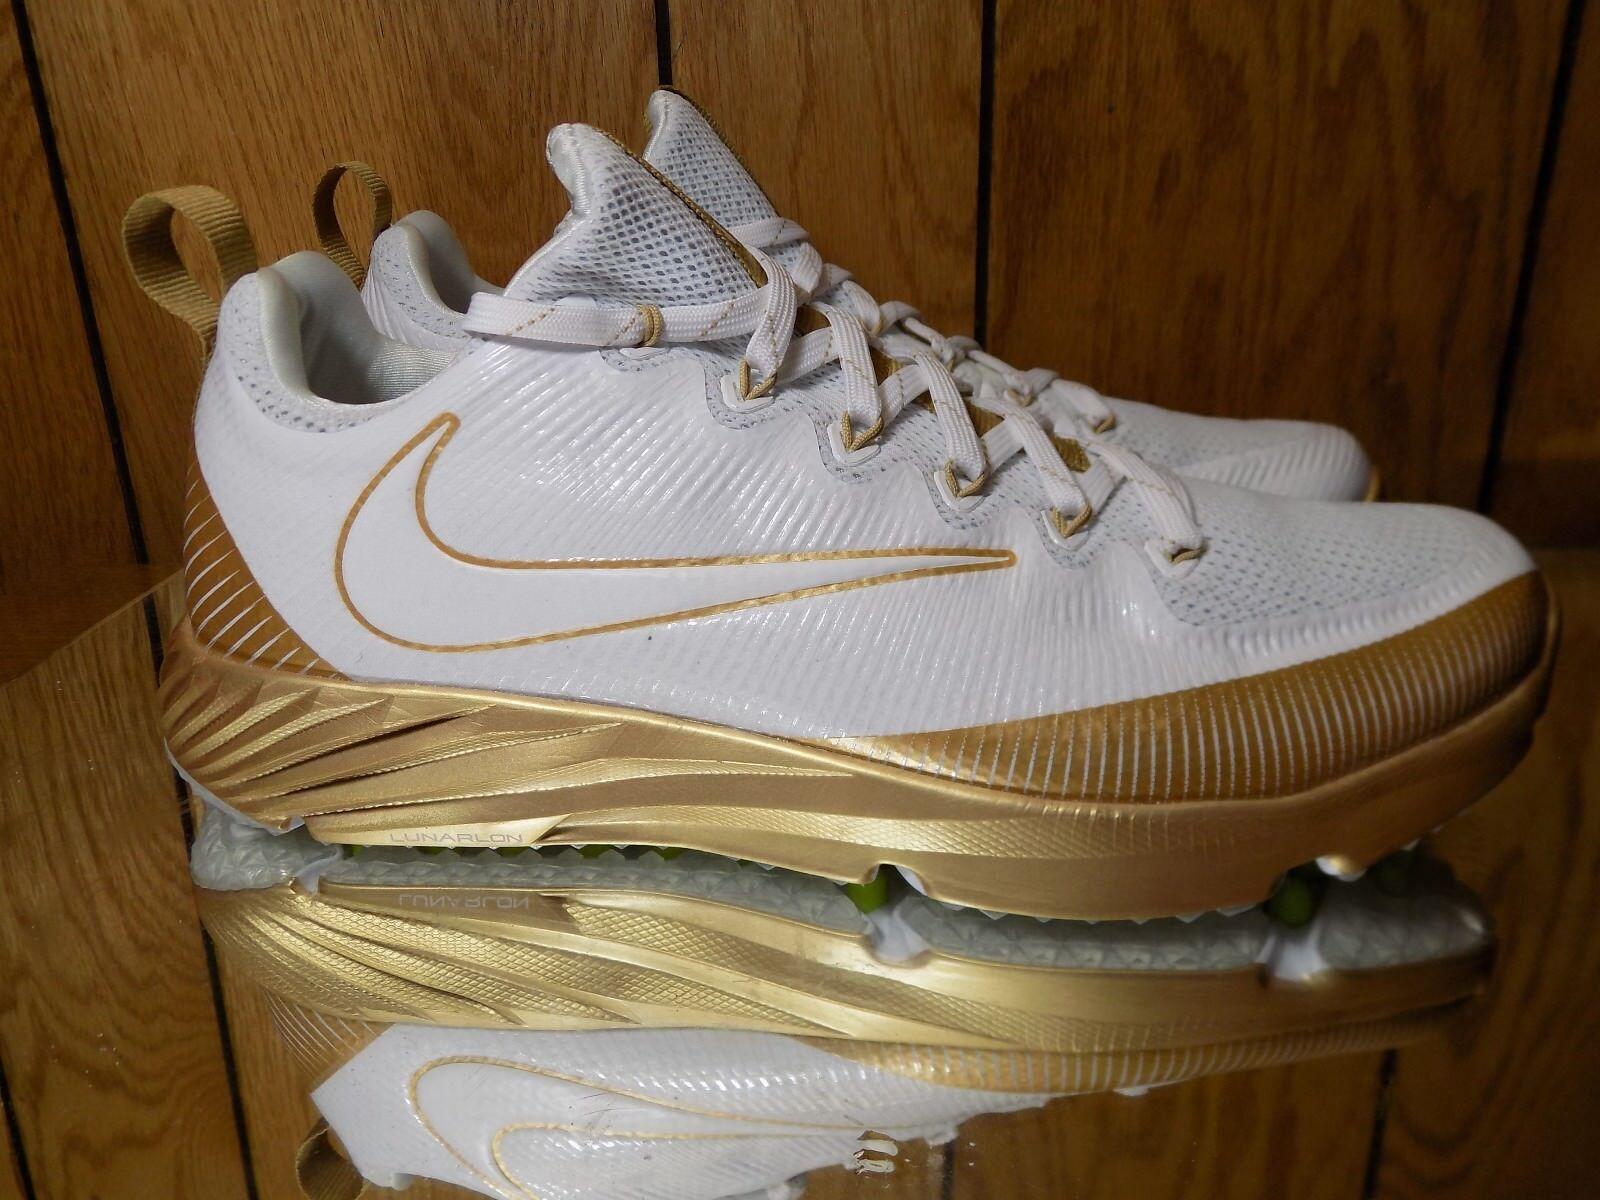 Nike Vapor Speed Turf Turf Turf LAX Football Trainer shoes gold White Size 9 833408-711 4ba396